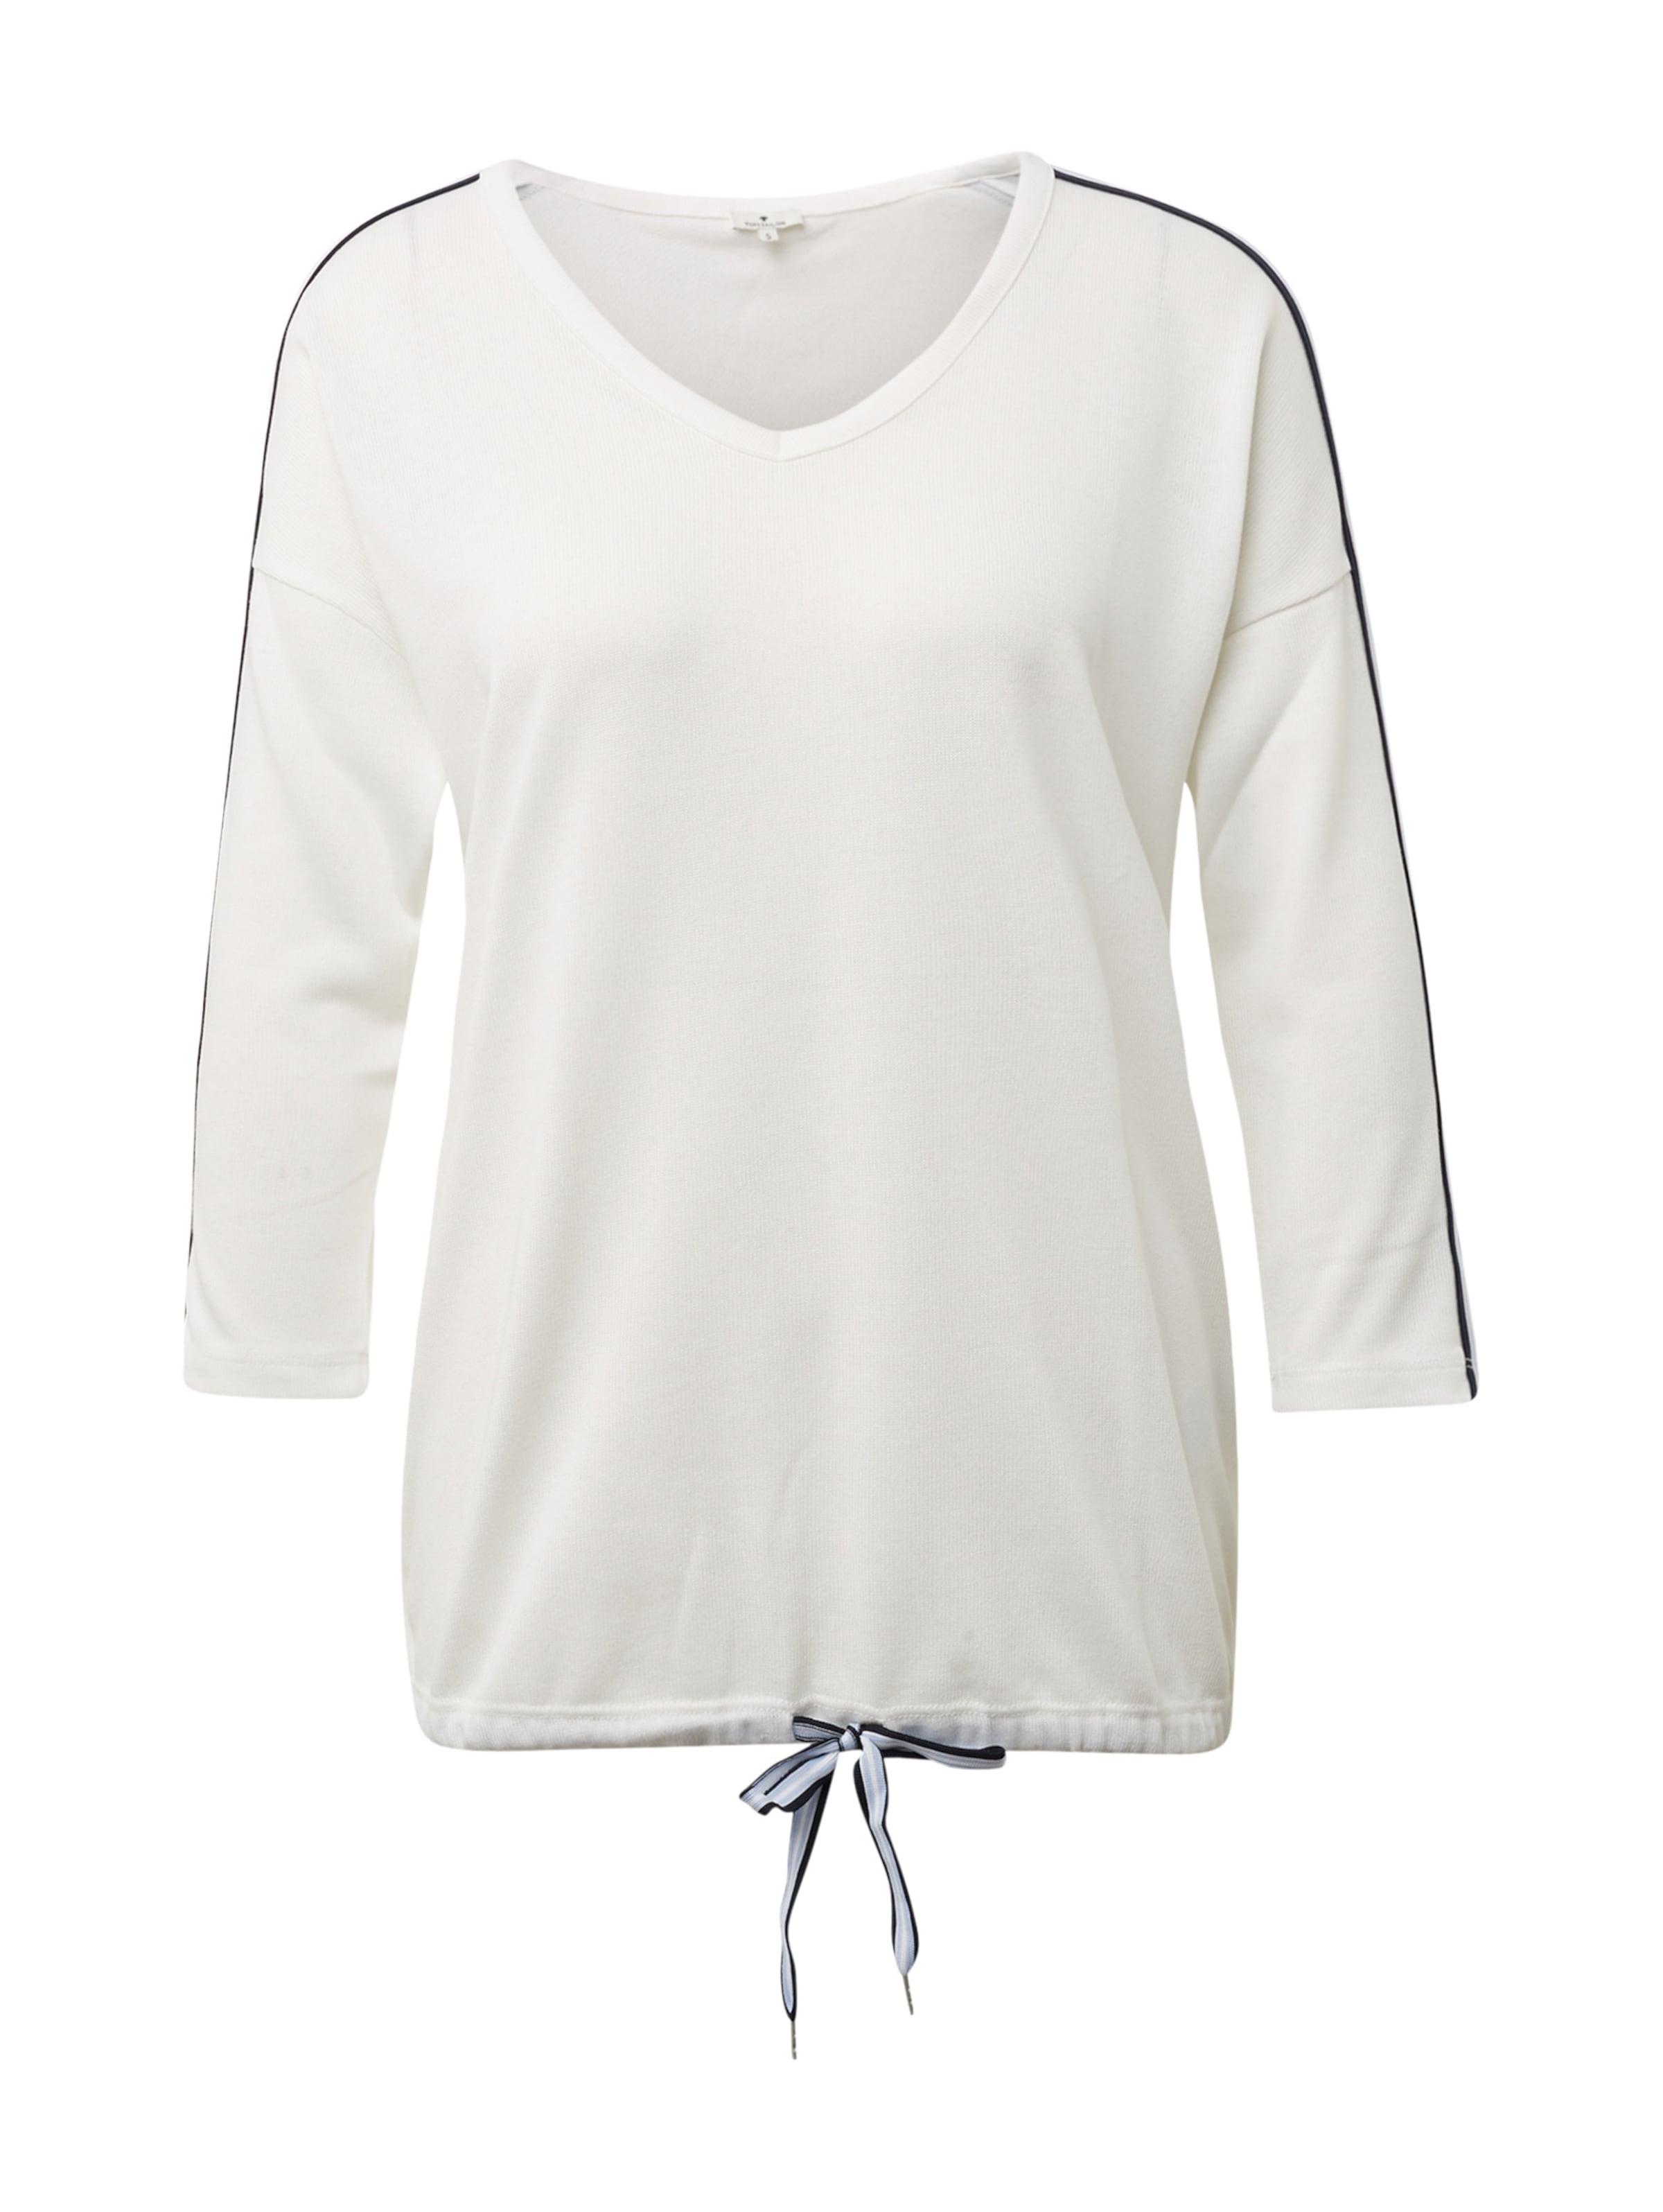 Bleu Tom Tailor shirt En NuitBlanc T nwN8mvO0